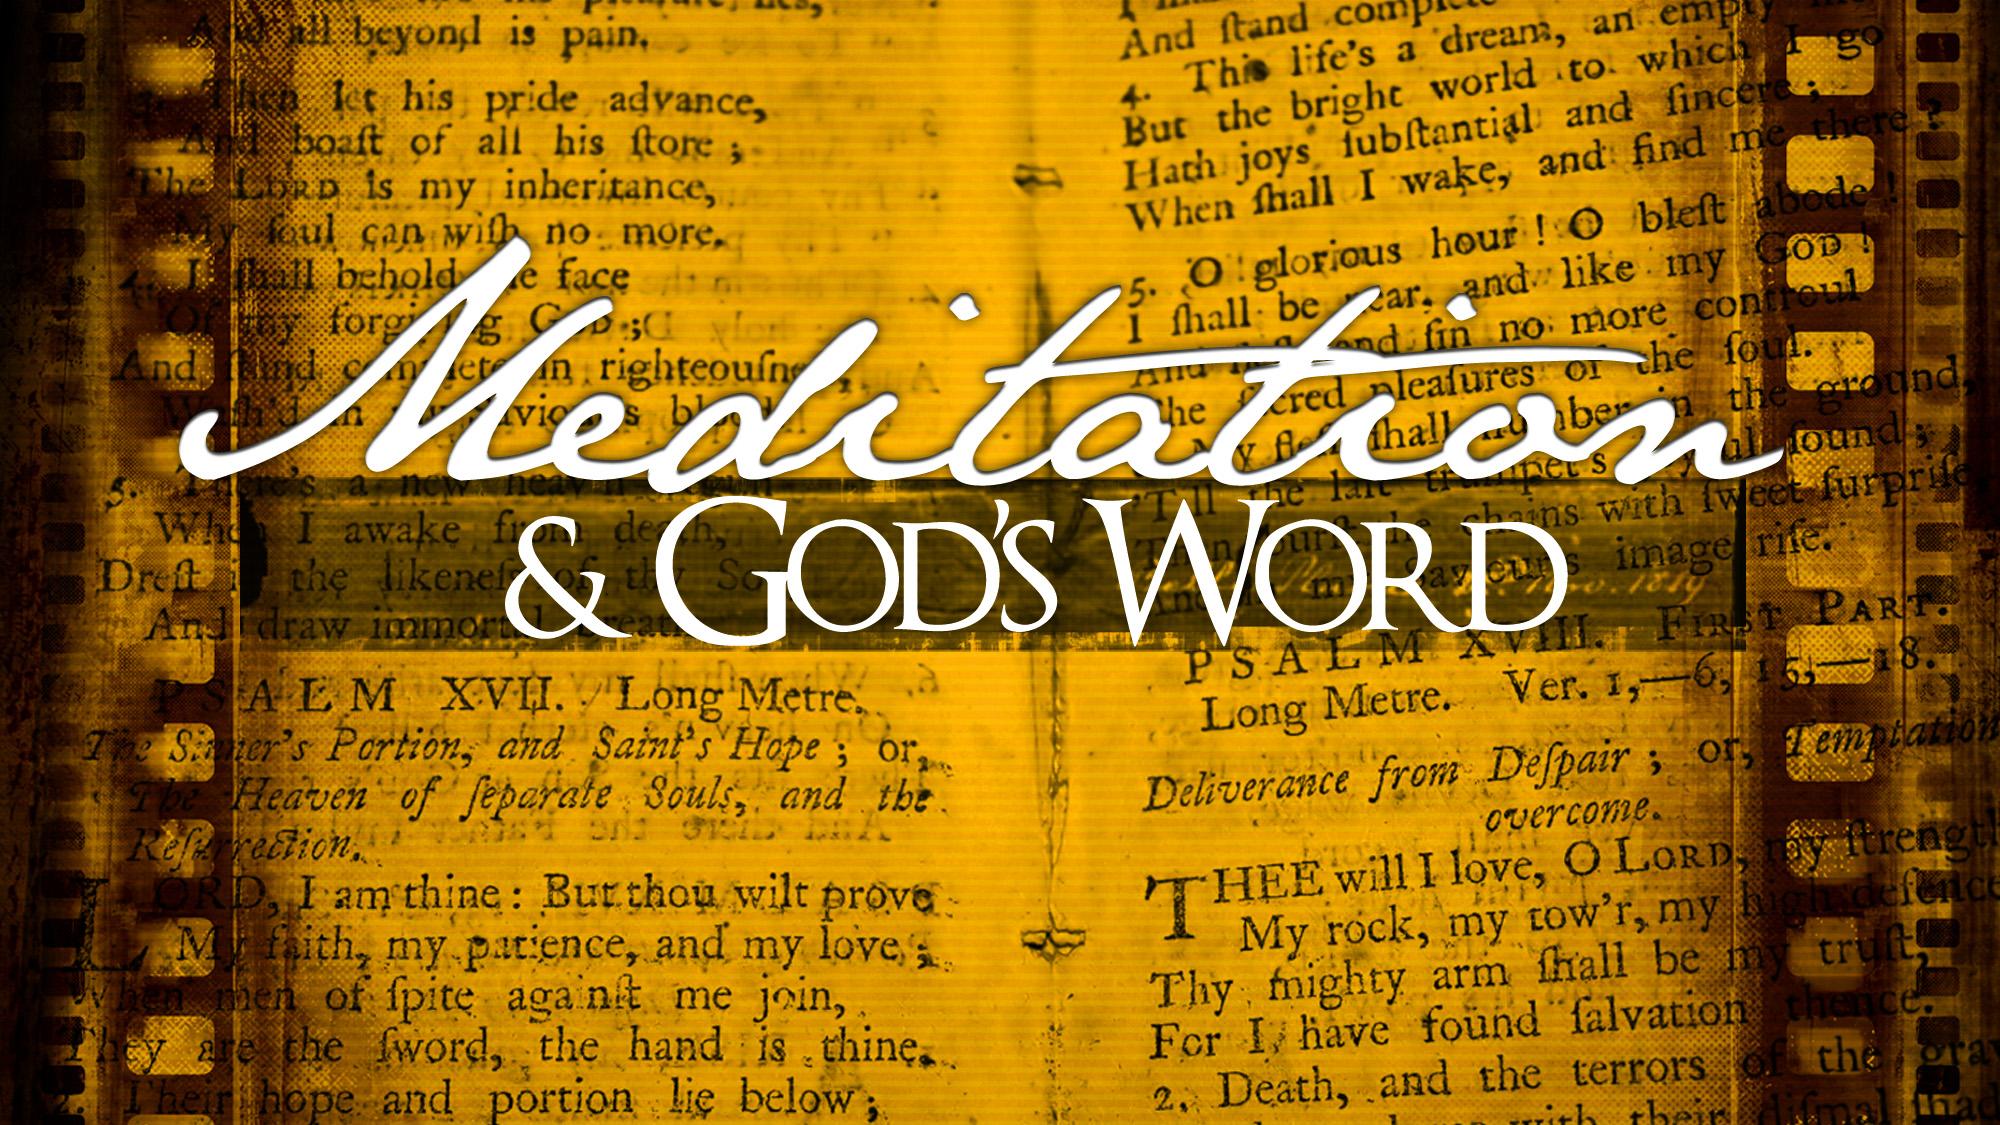 Meditation on the word of god